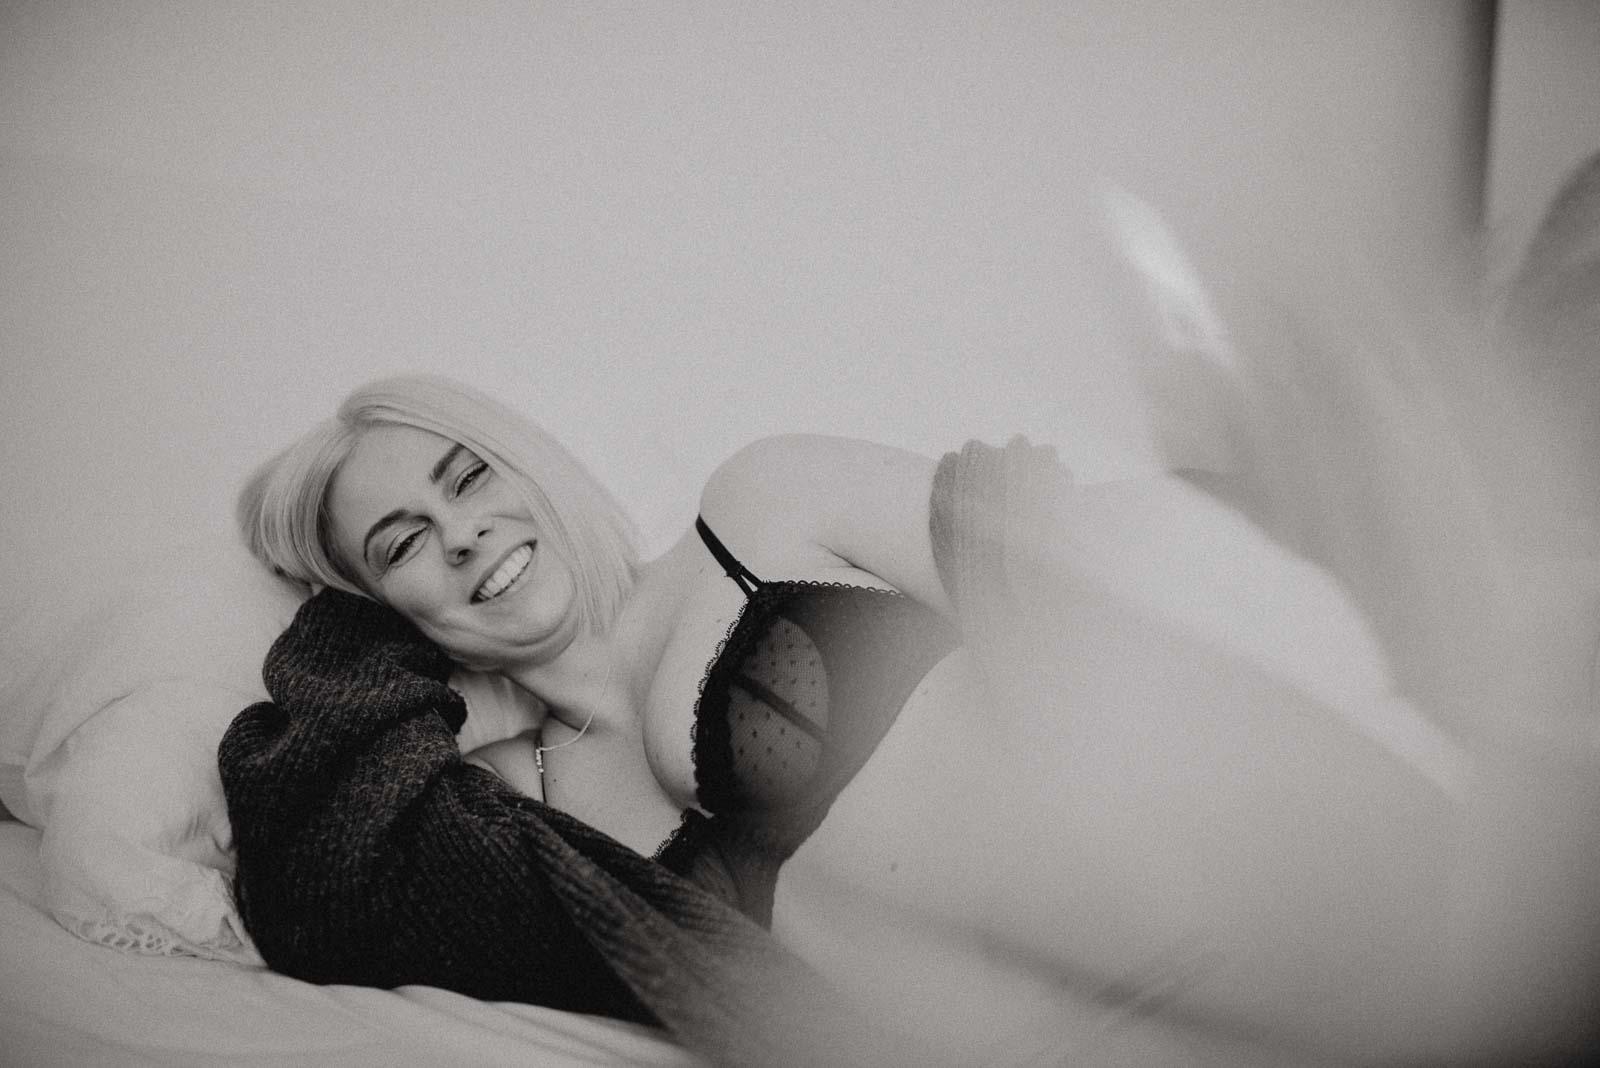 014-fotoshooting boudoir mit lipoedem als homeshooting_